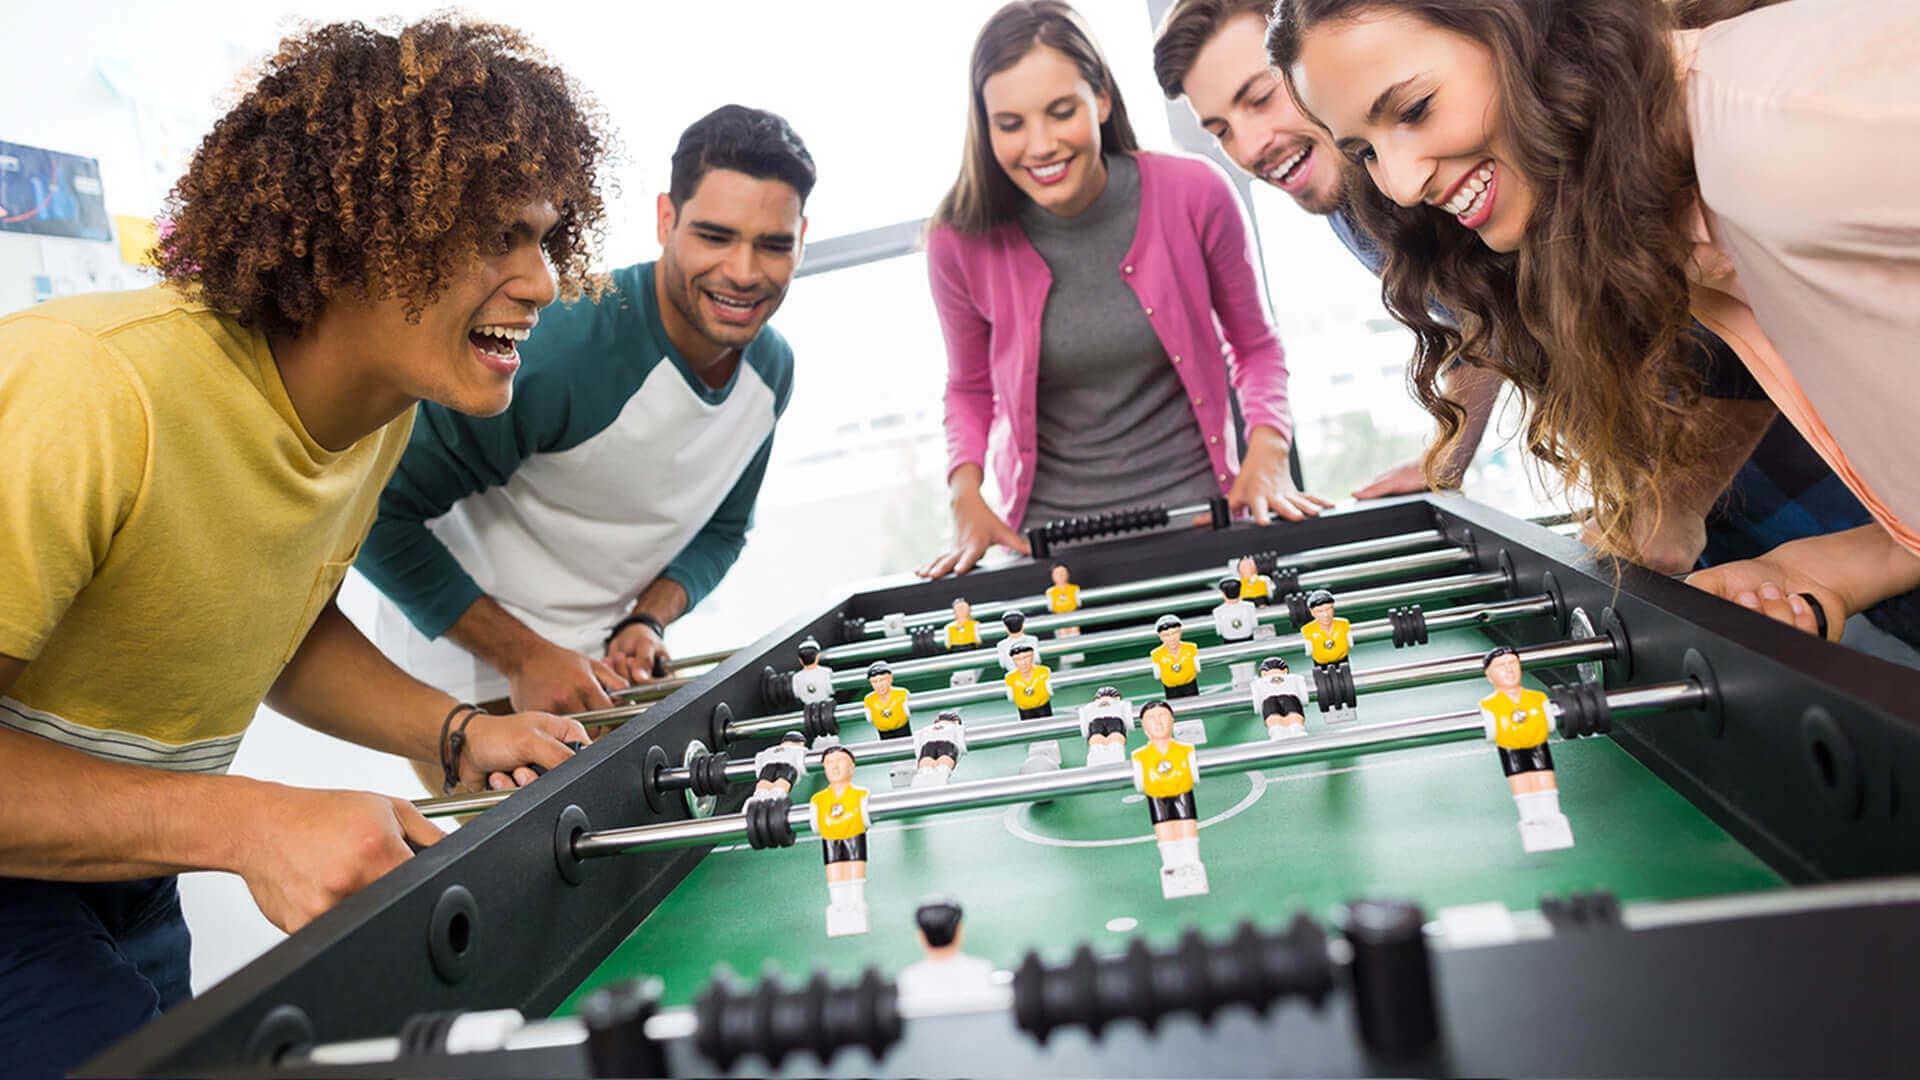 Axis T Arcade Game Amp Event Rentals In Utah